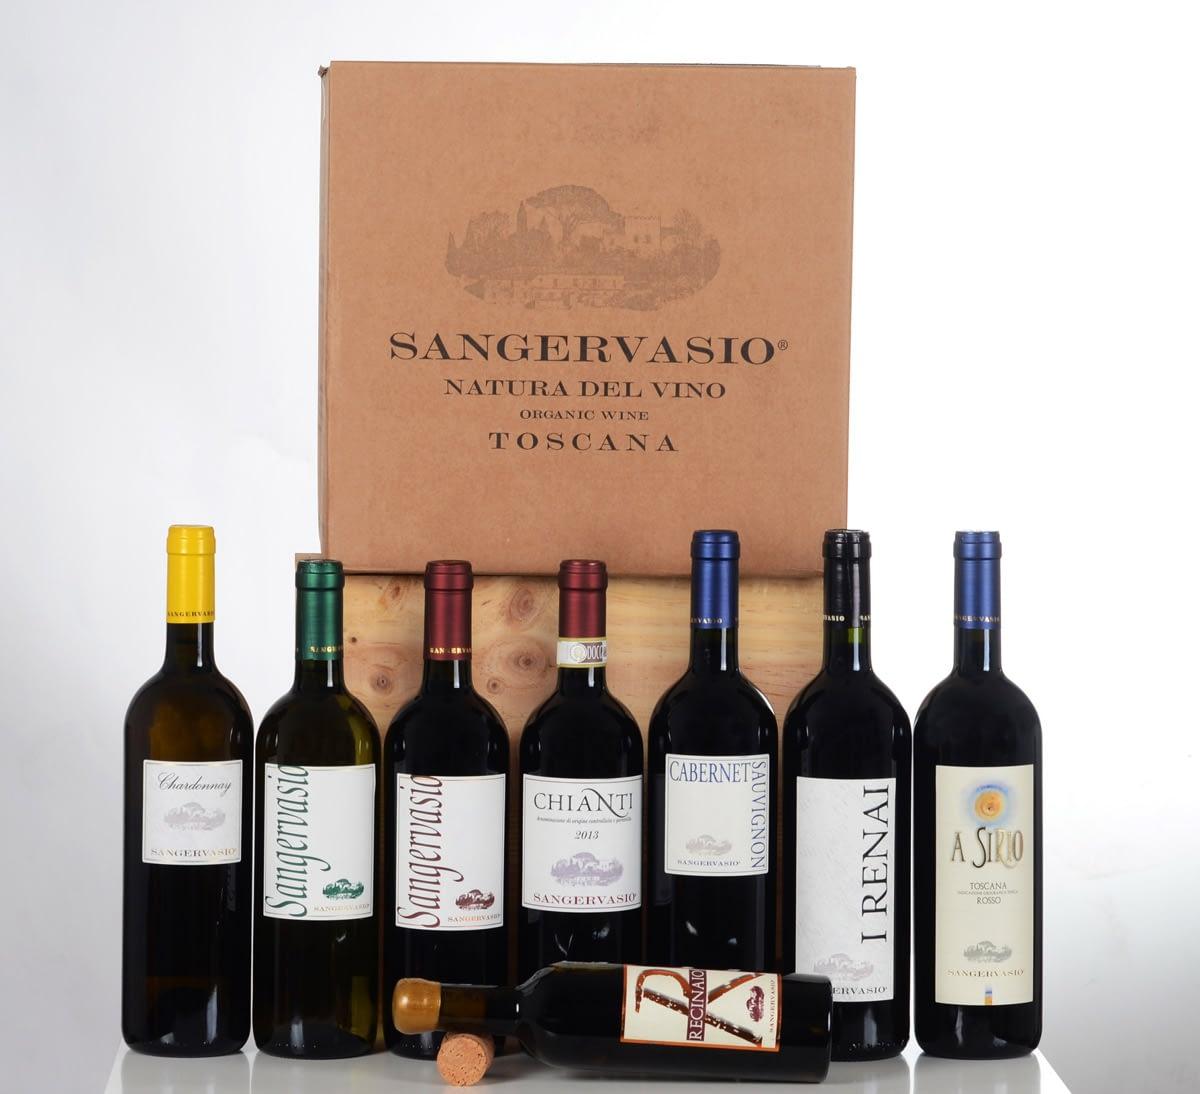 Vini di San Gervasio